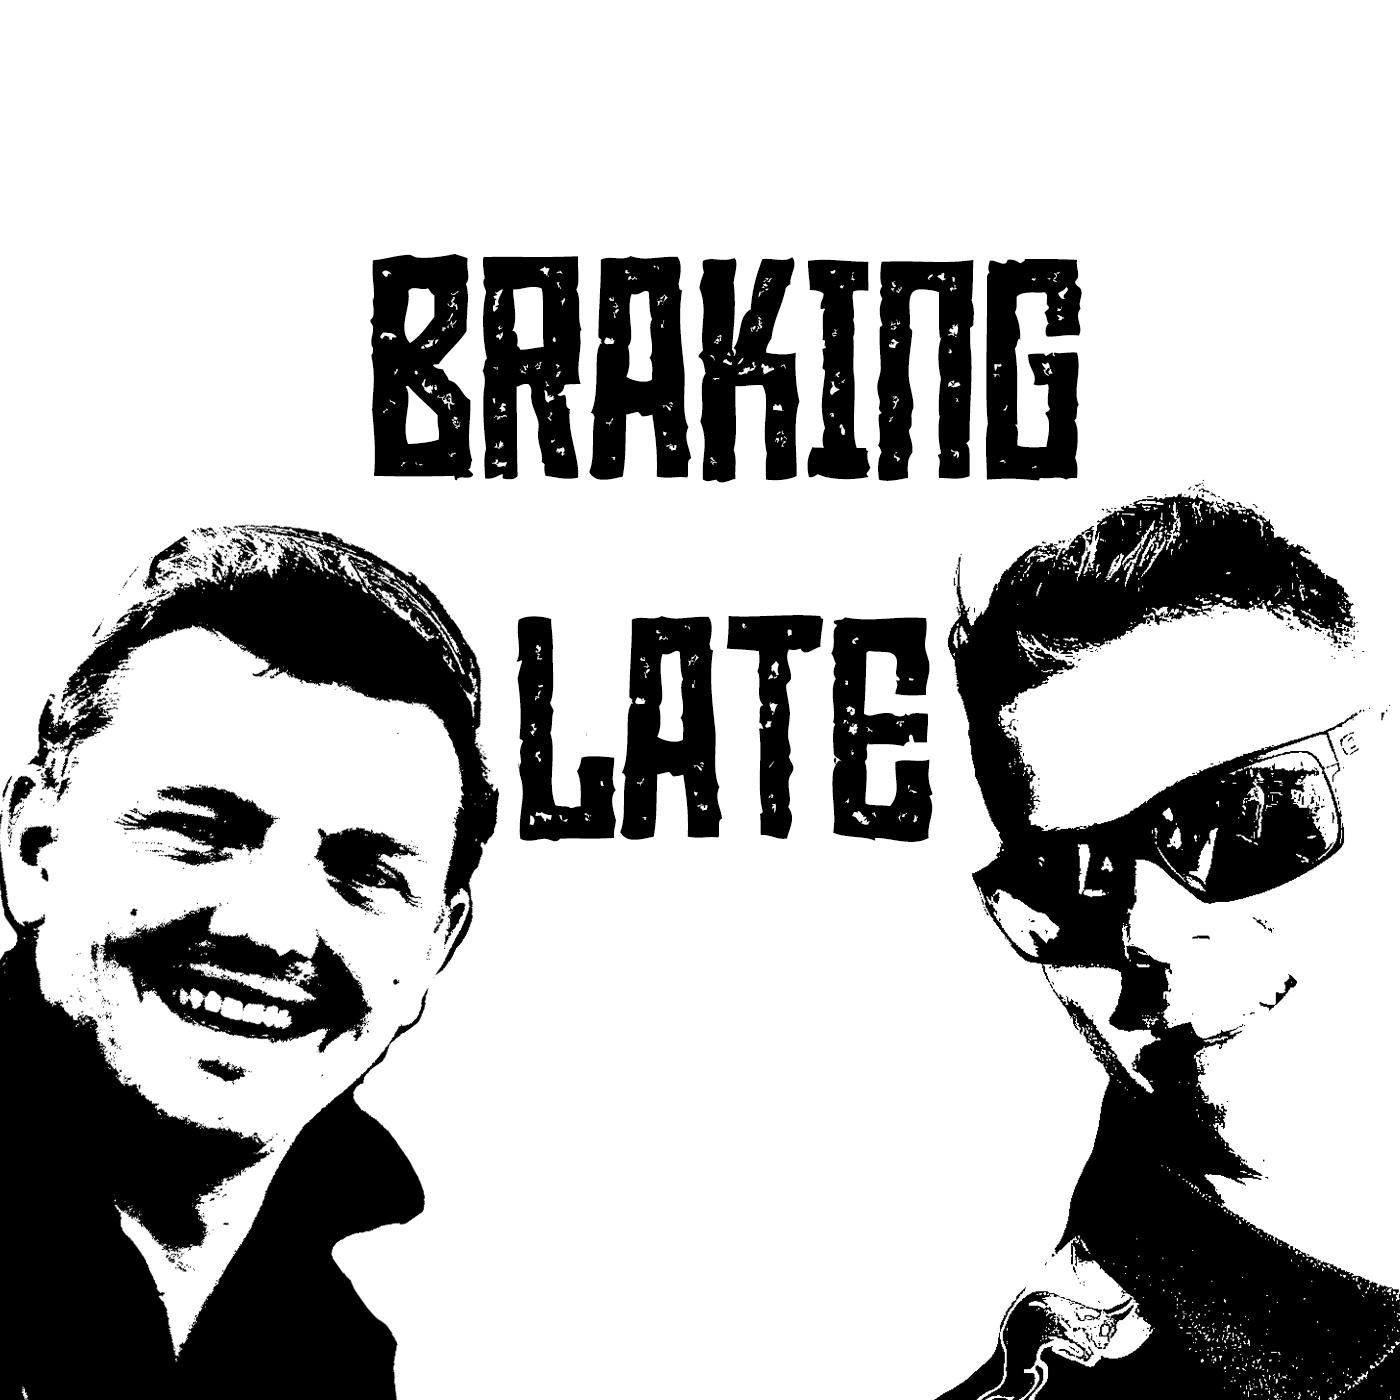 Braking late artwork.jpg